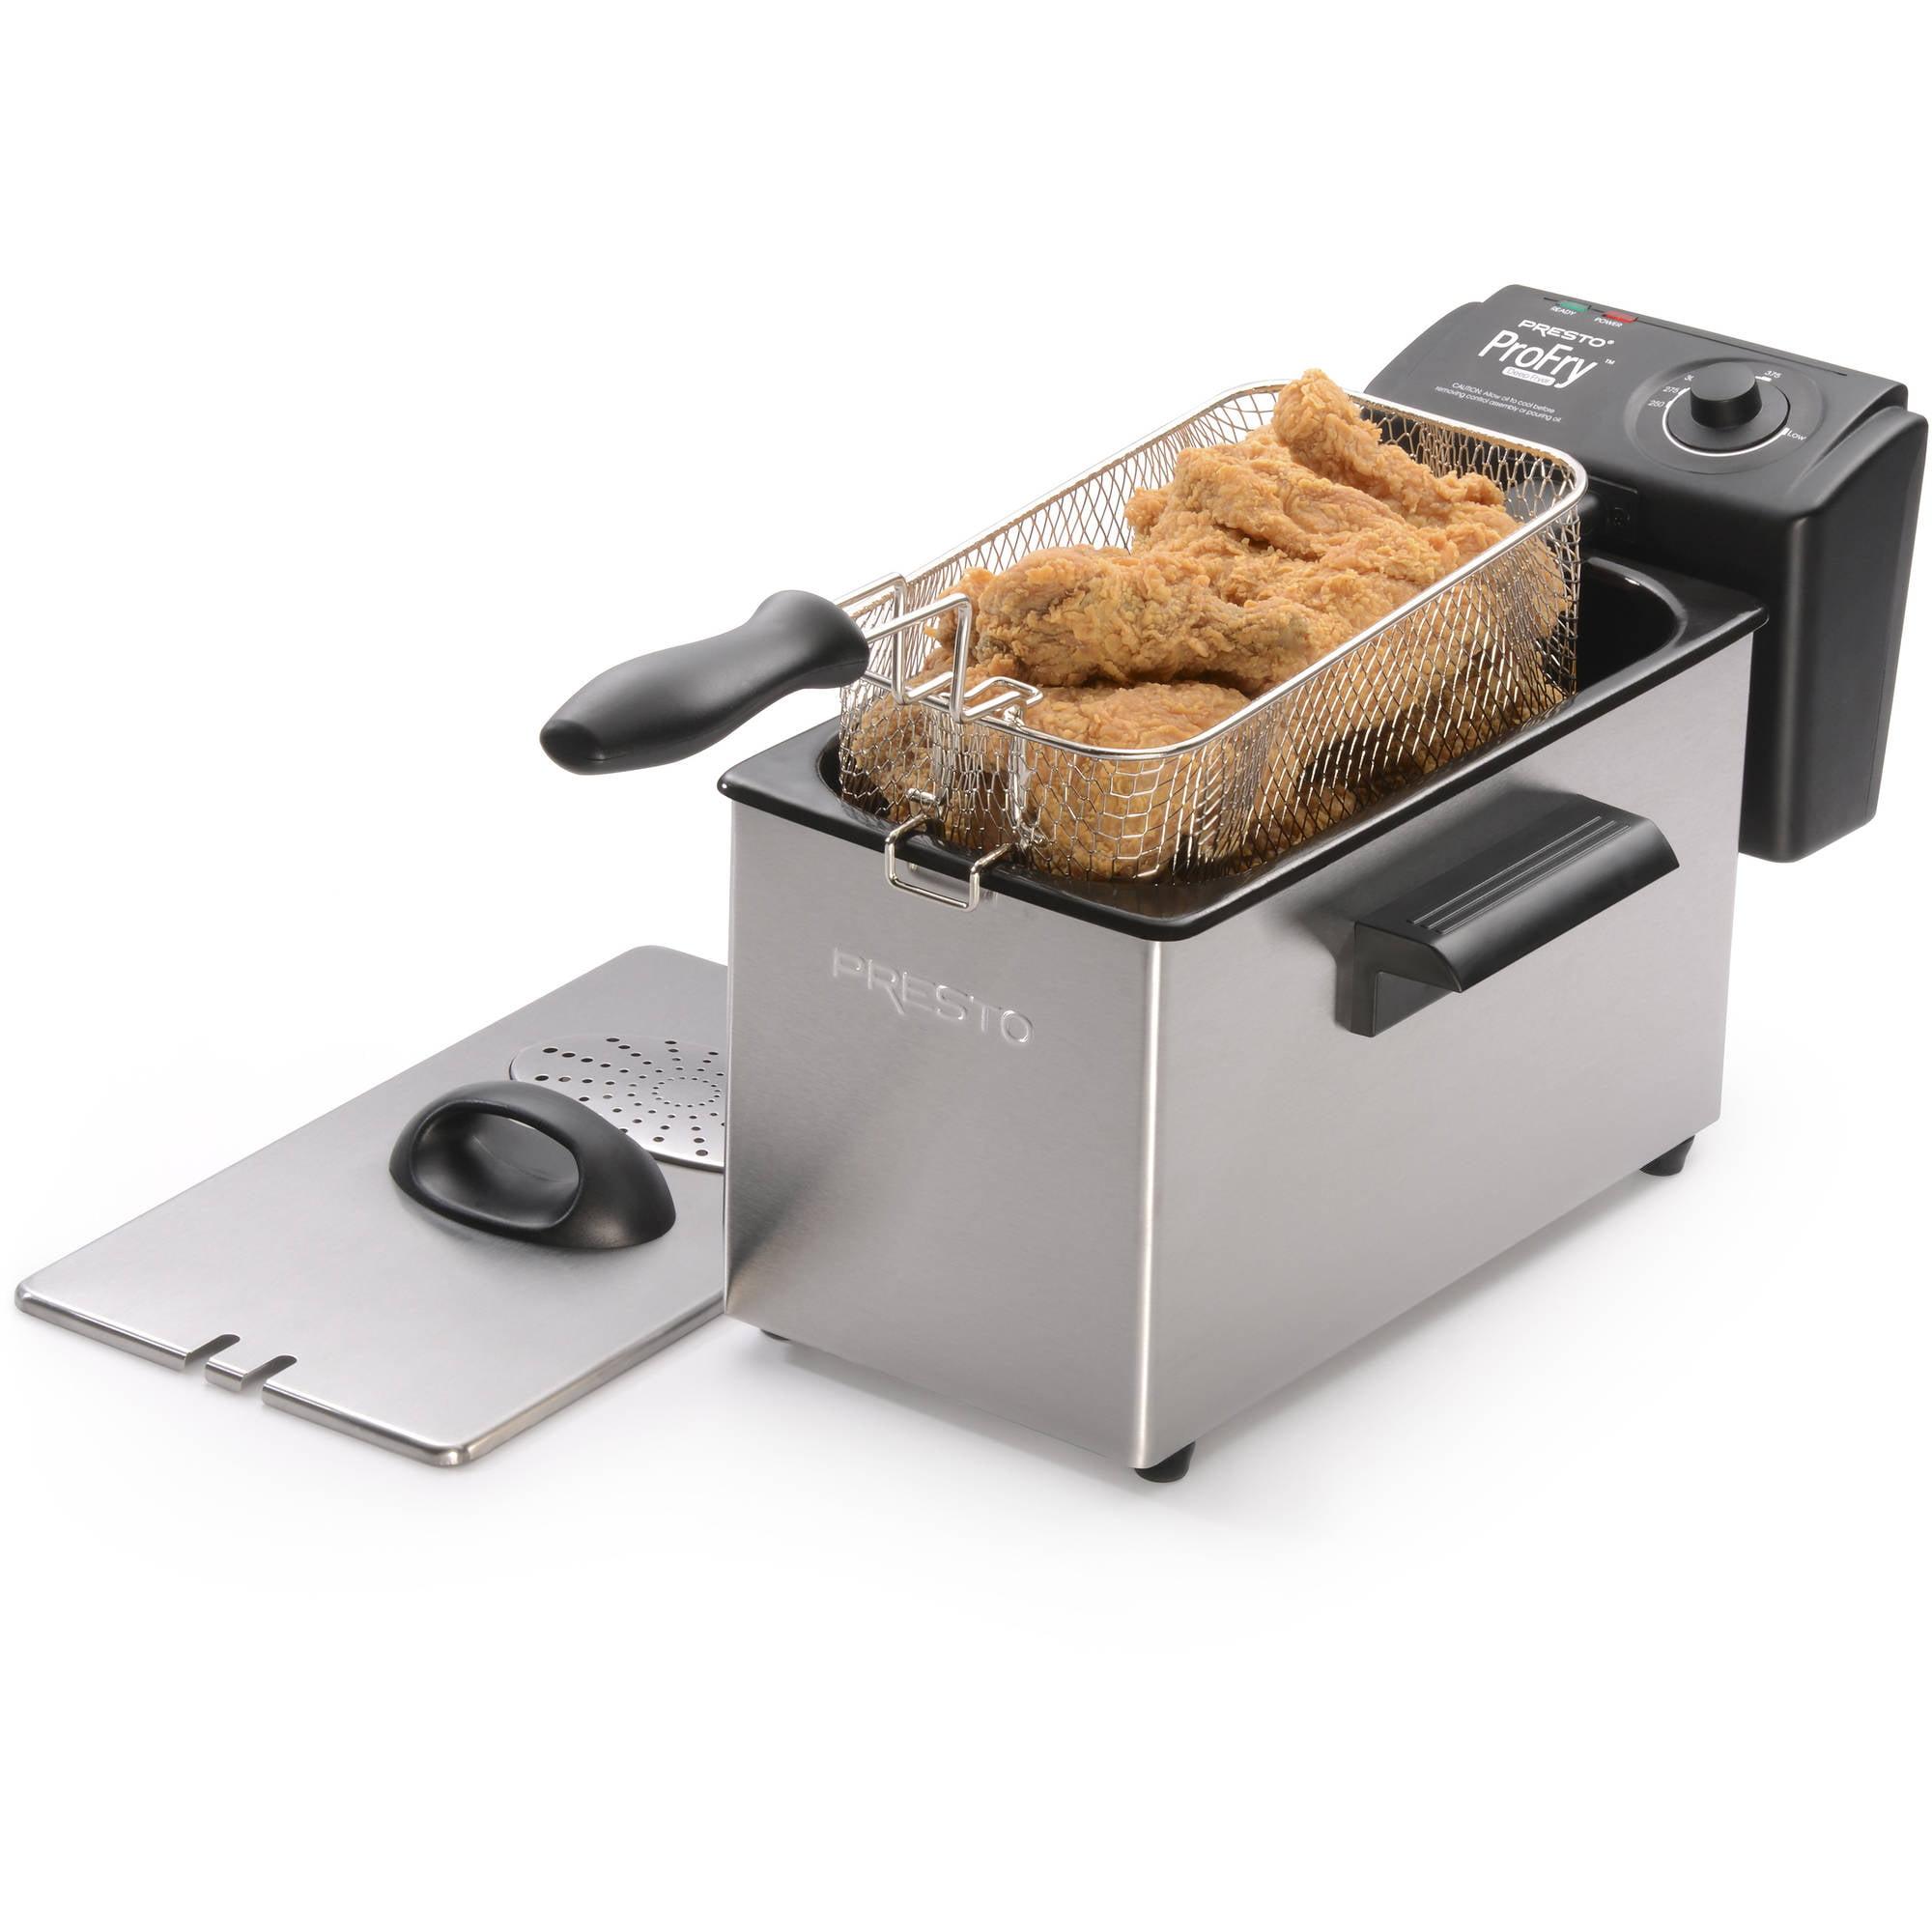 Presto Deep Fryer, 3.5 L